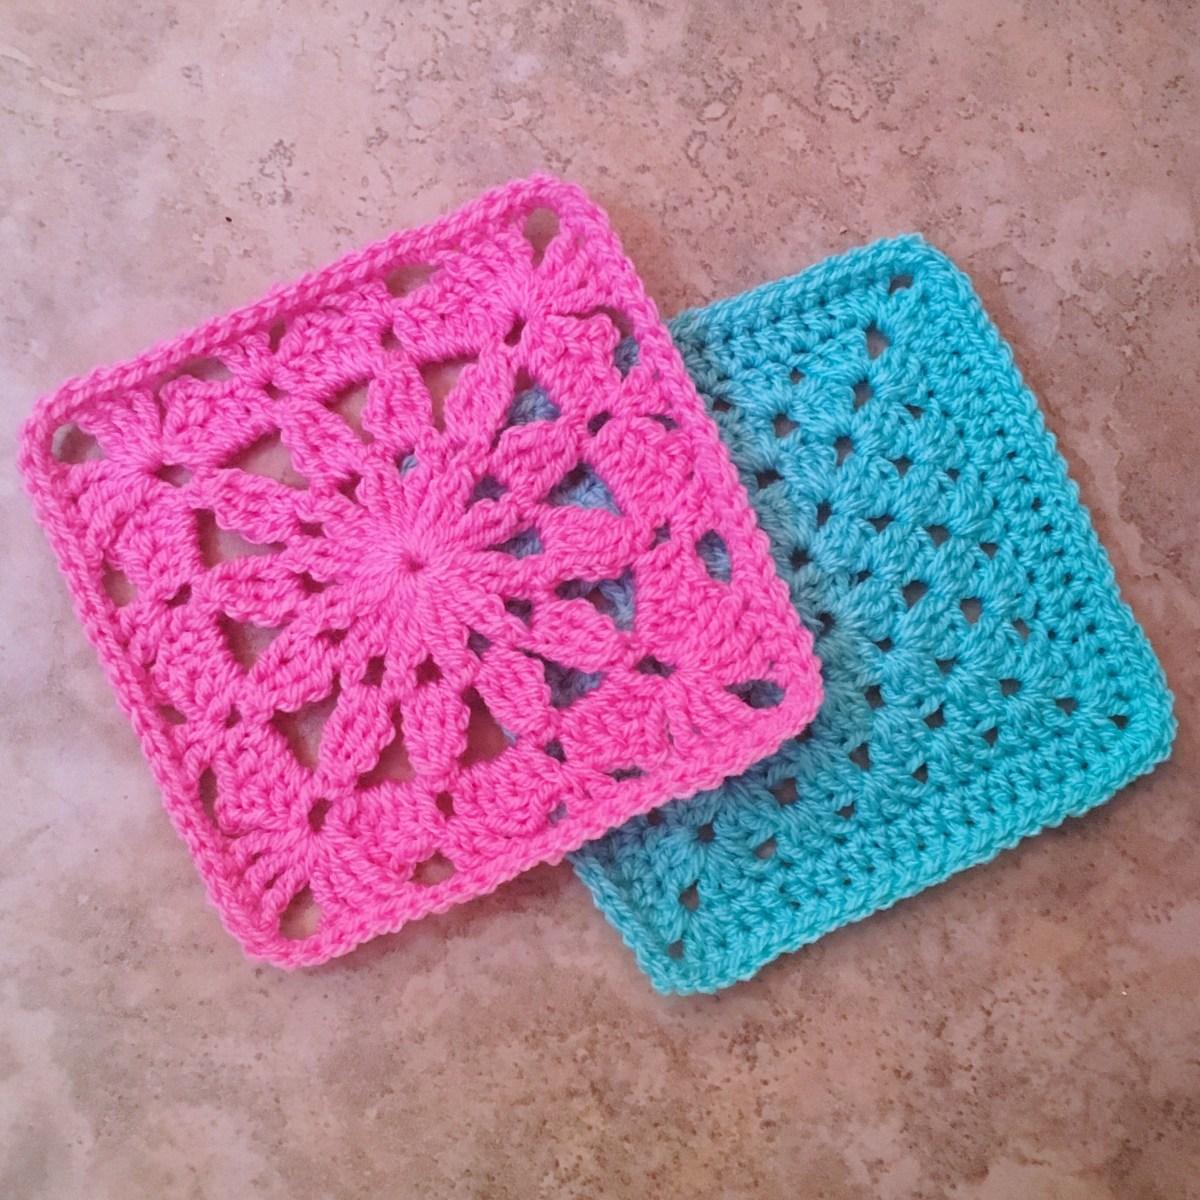 Crochet Motif - Ana Maria Square